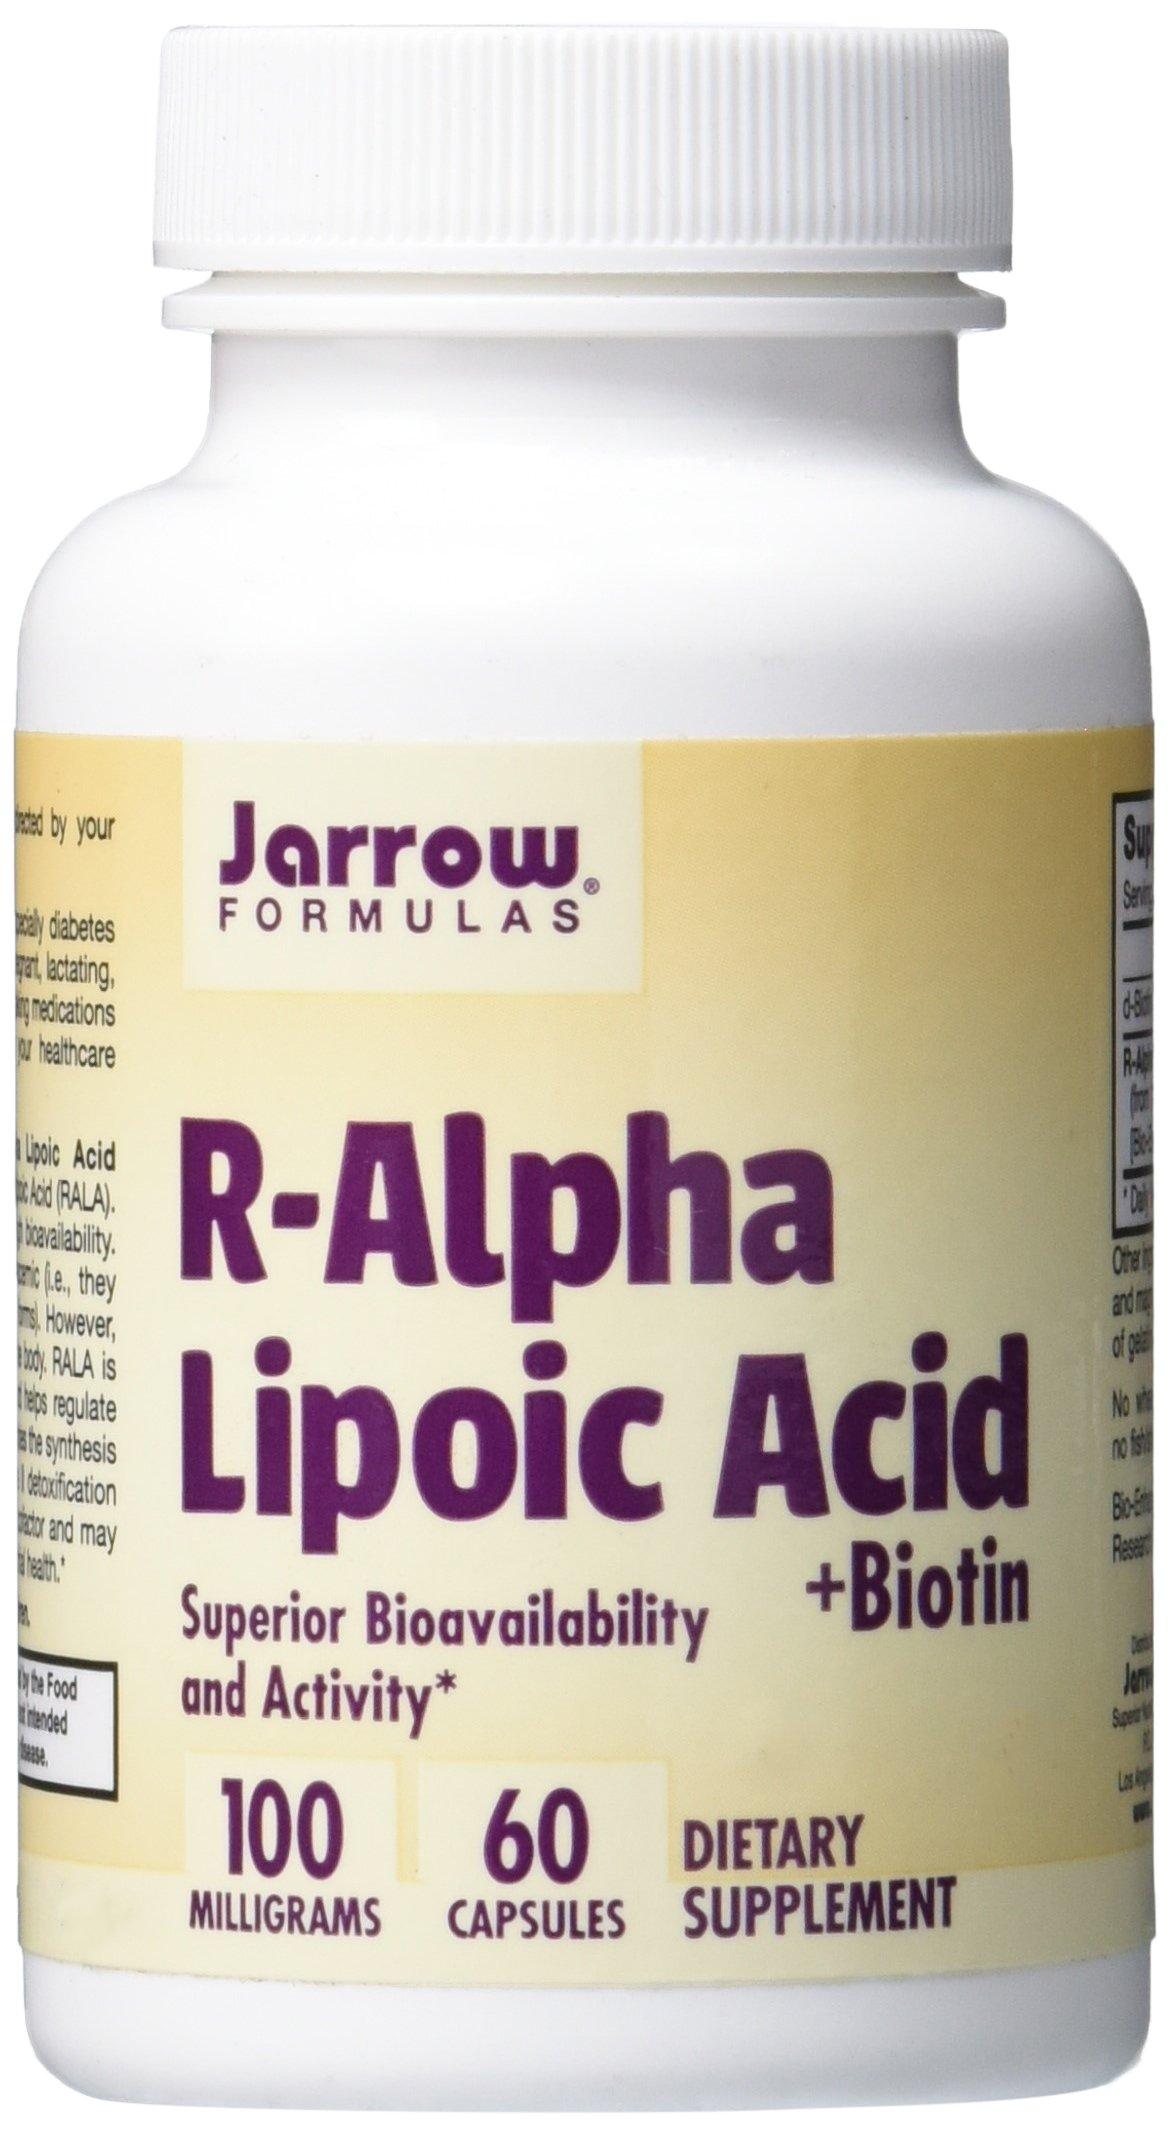 71W6Qq1ViGL - Jarrow Formulas Jarrow R-Alpha Lipoic Acid with Biotin (100mg, 60 Capsules), 1 Units